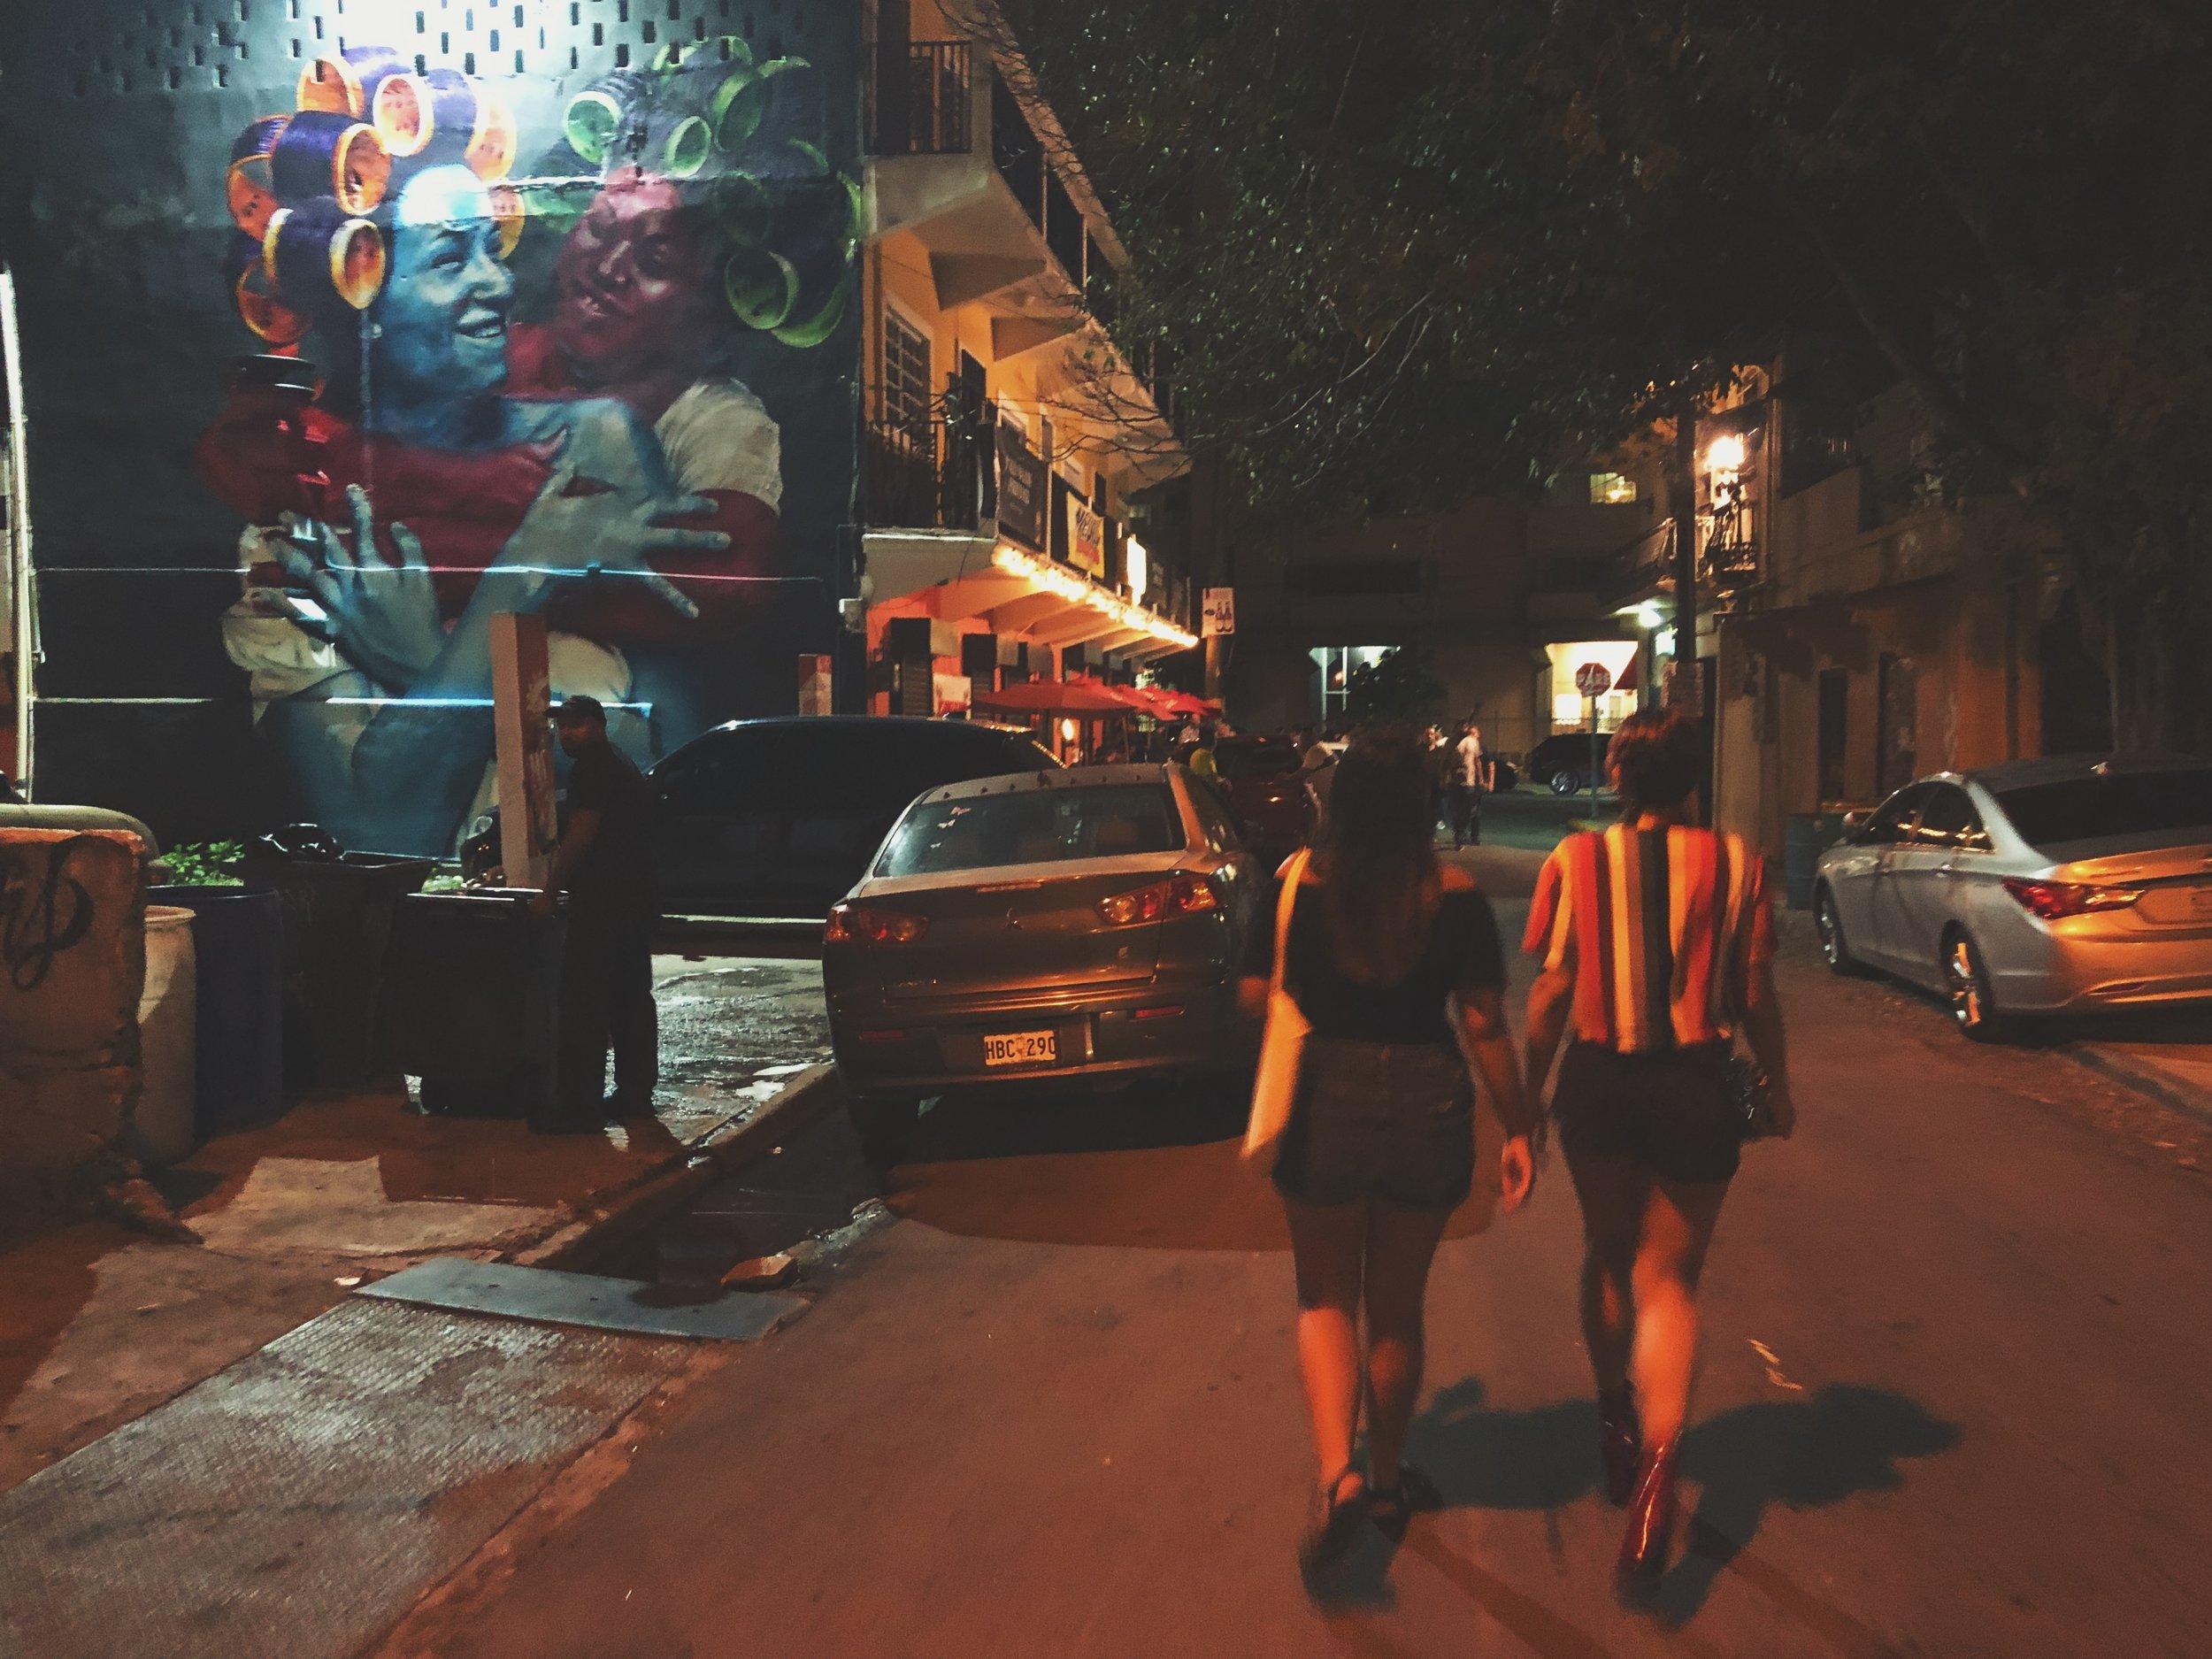 street art in Puerto Rico | la placita de santurce